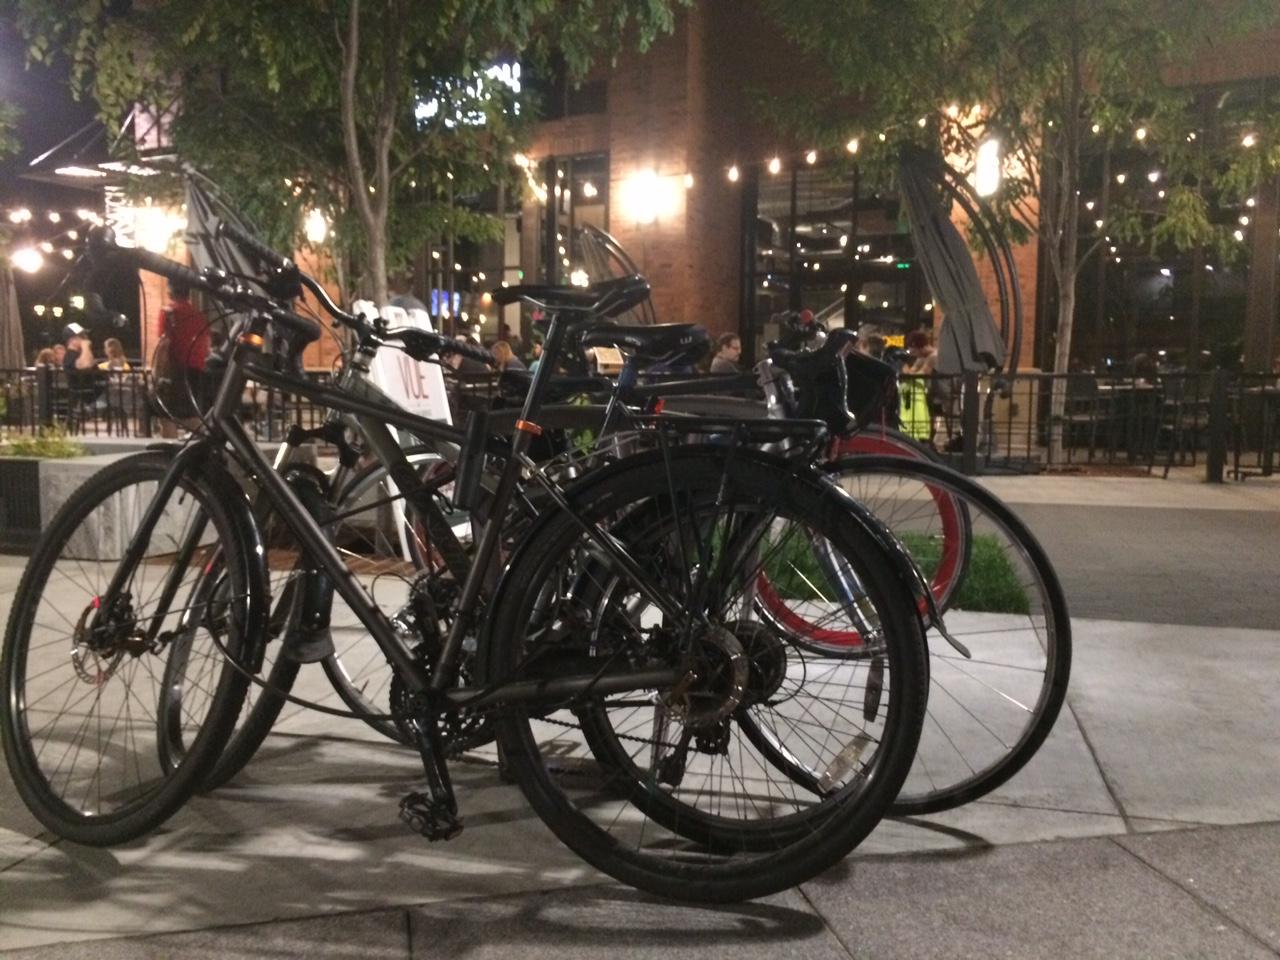 Bikes in Sugarhouse, Salt Lake City. Photo by Dave Iltis